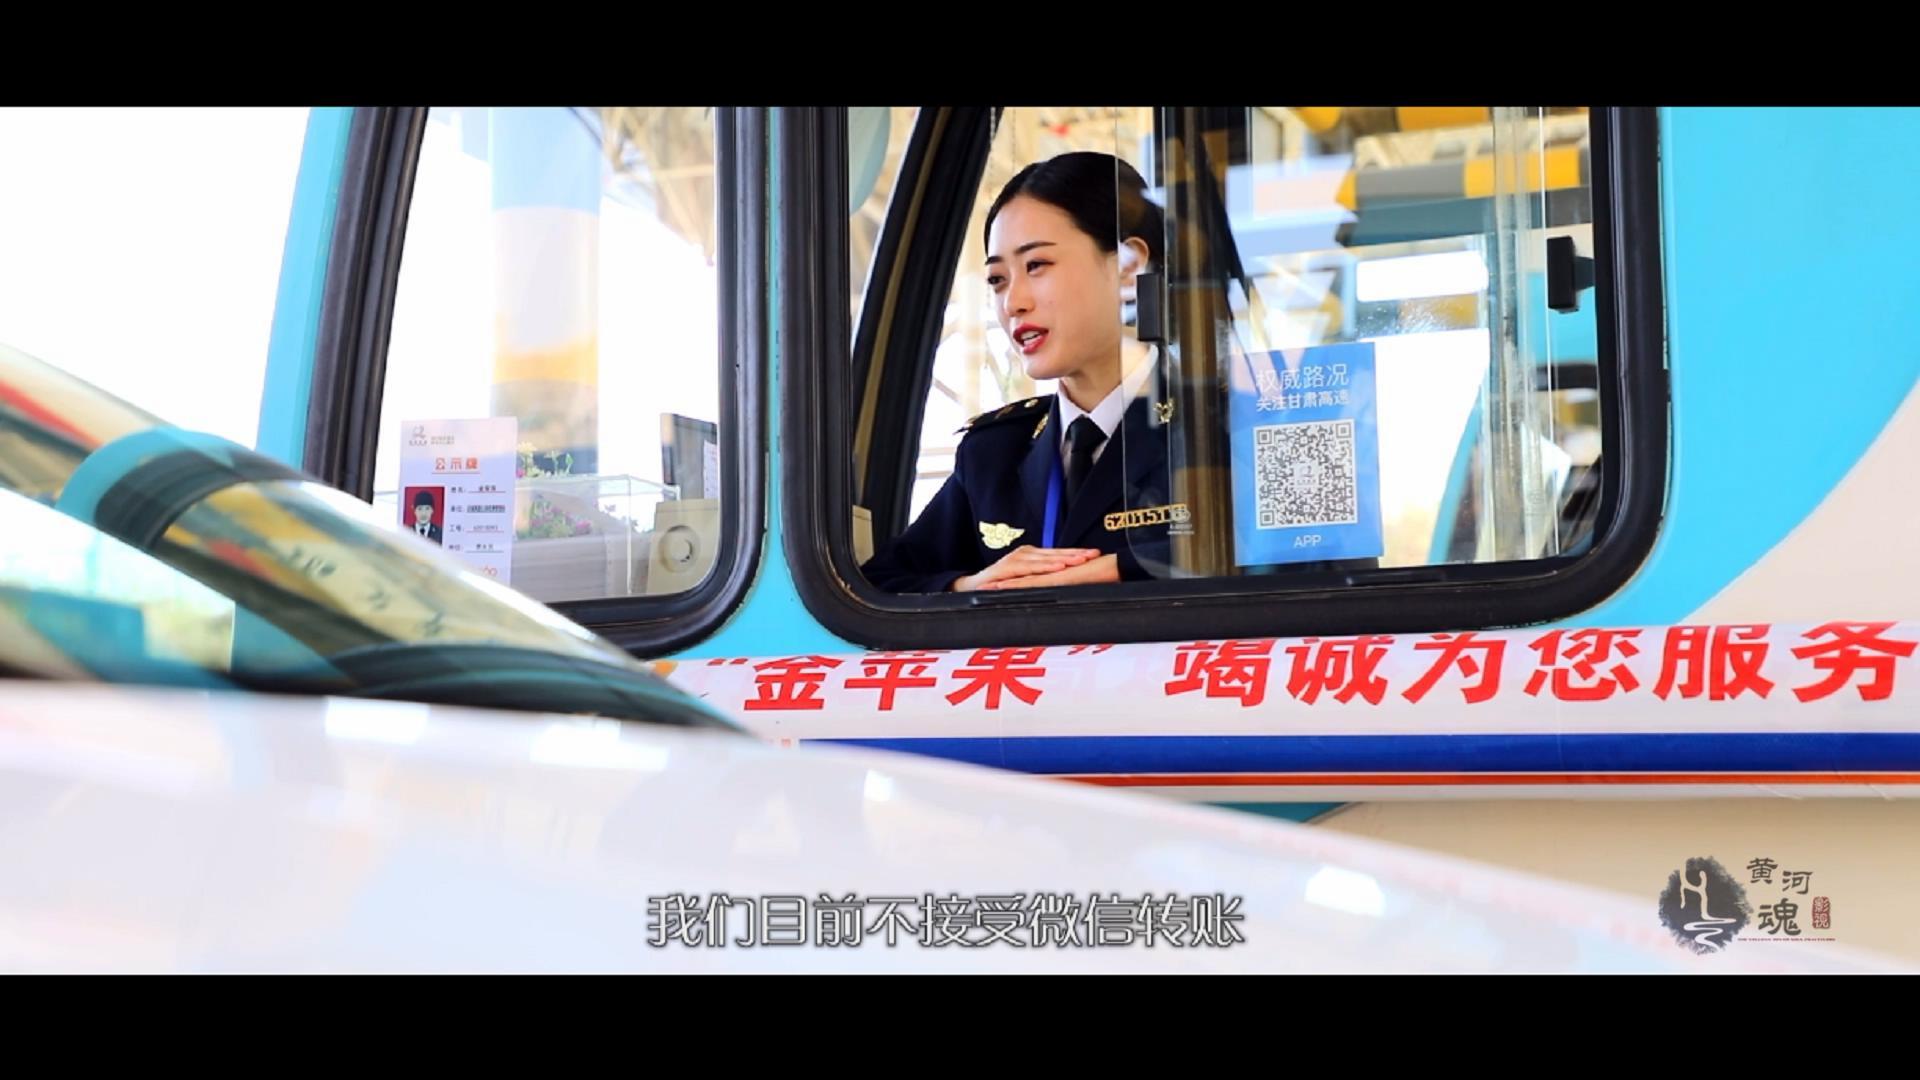 <font color='#333333'>庆城高管所微电影《无悔青春》摄制完成</font>